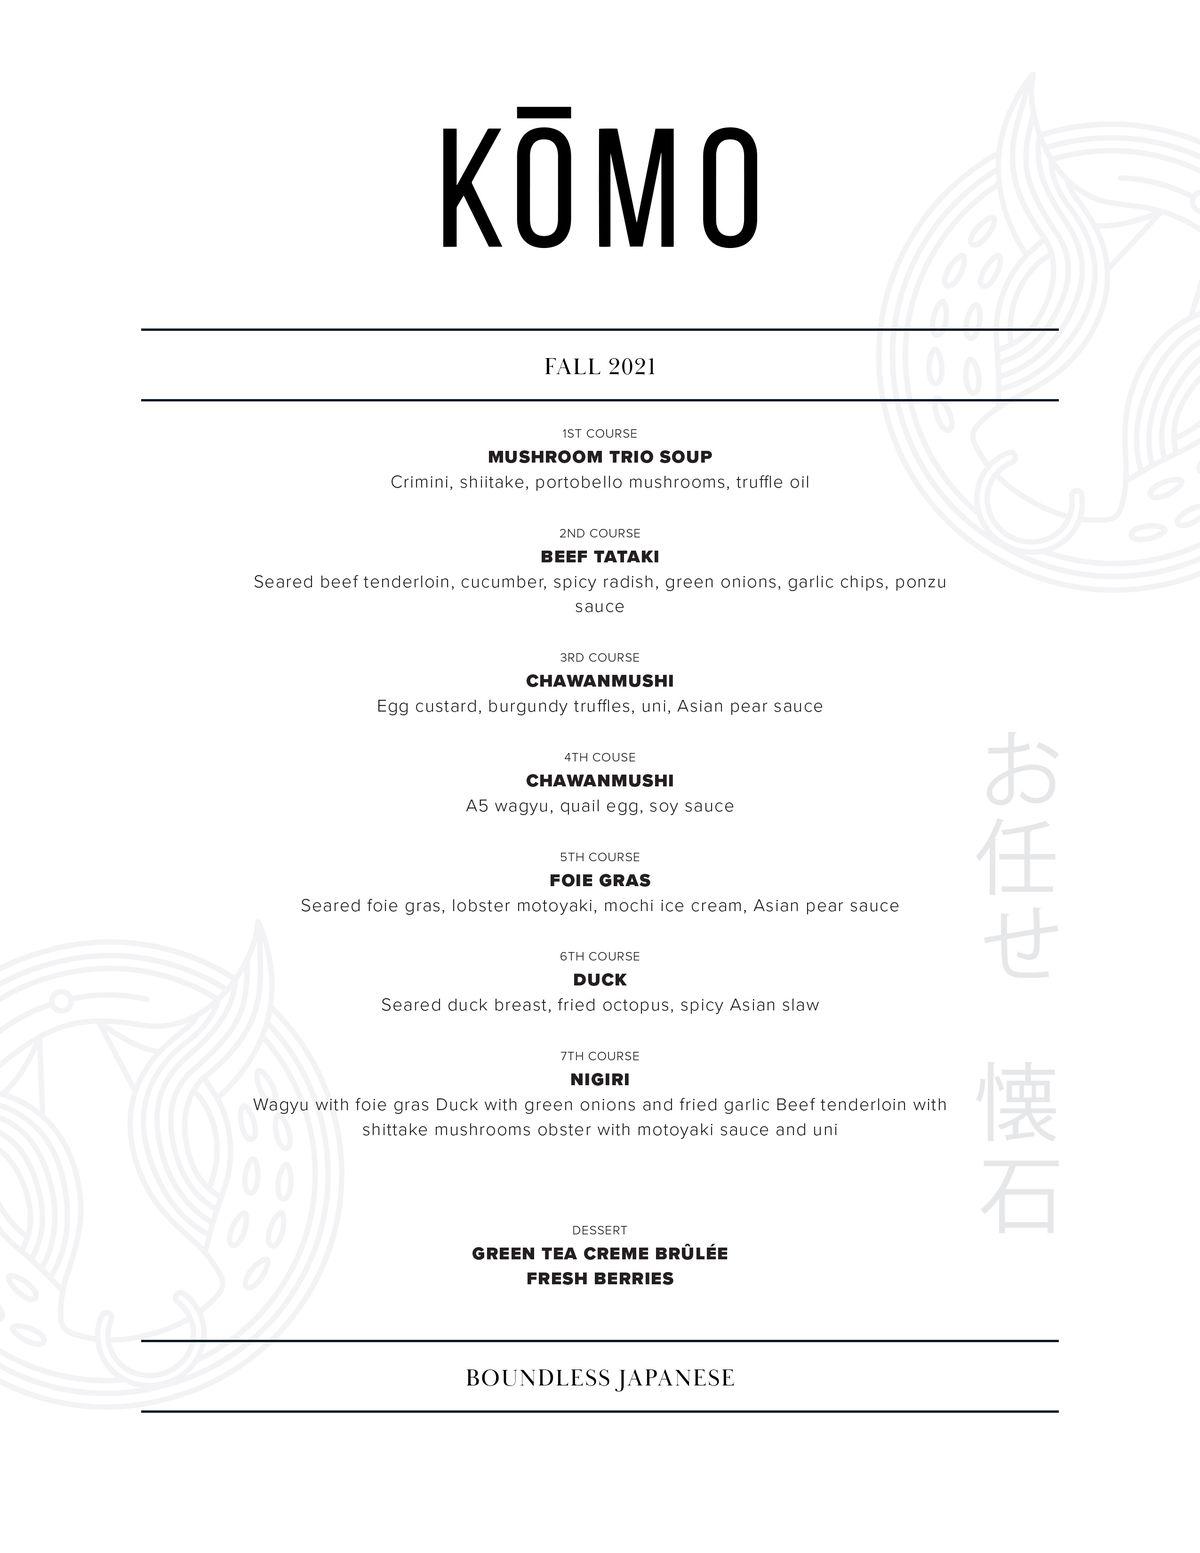 A Japanese restaurant's menu